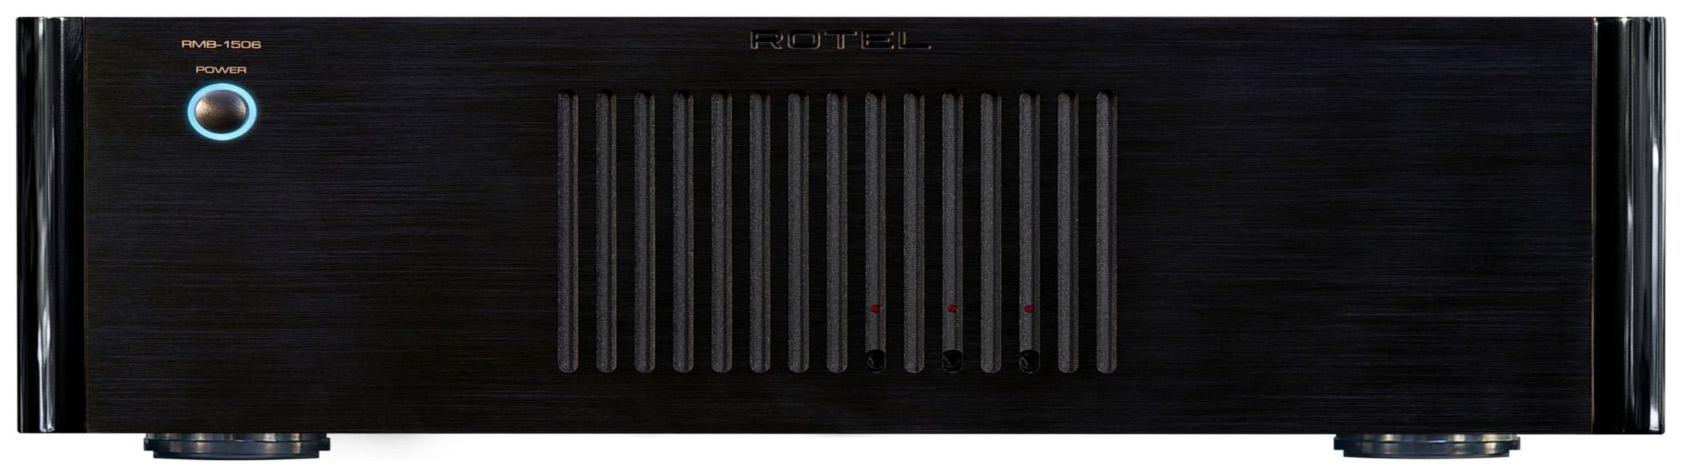 Усилитель мощности Rotel RMB 1506 Black